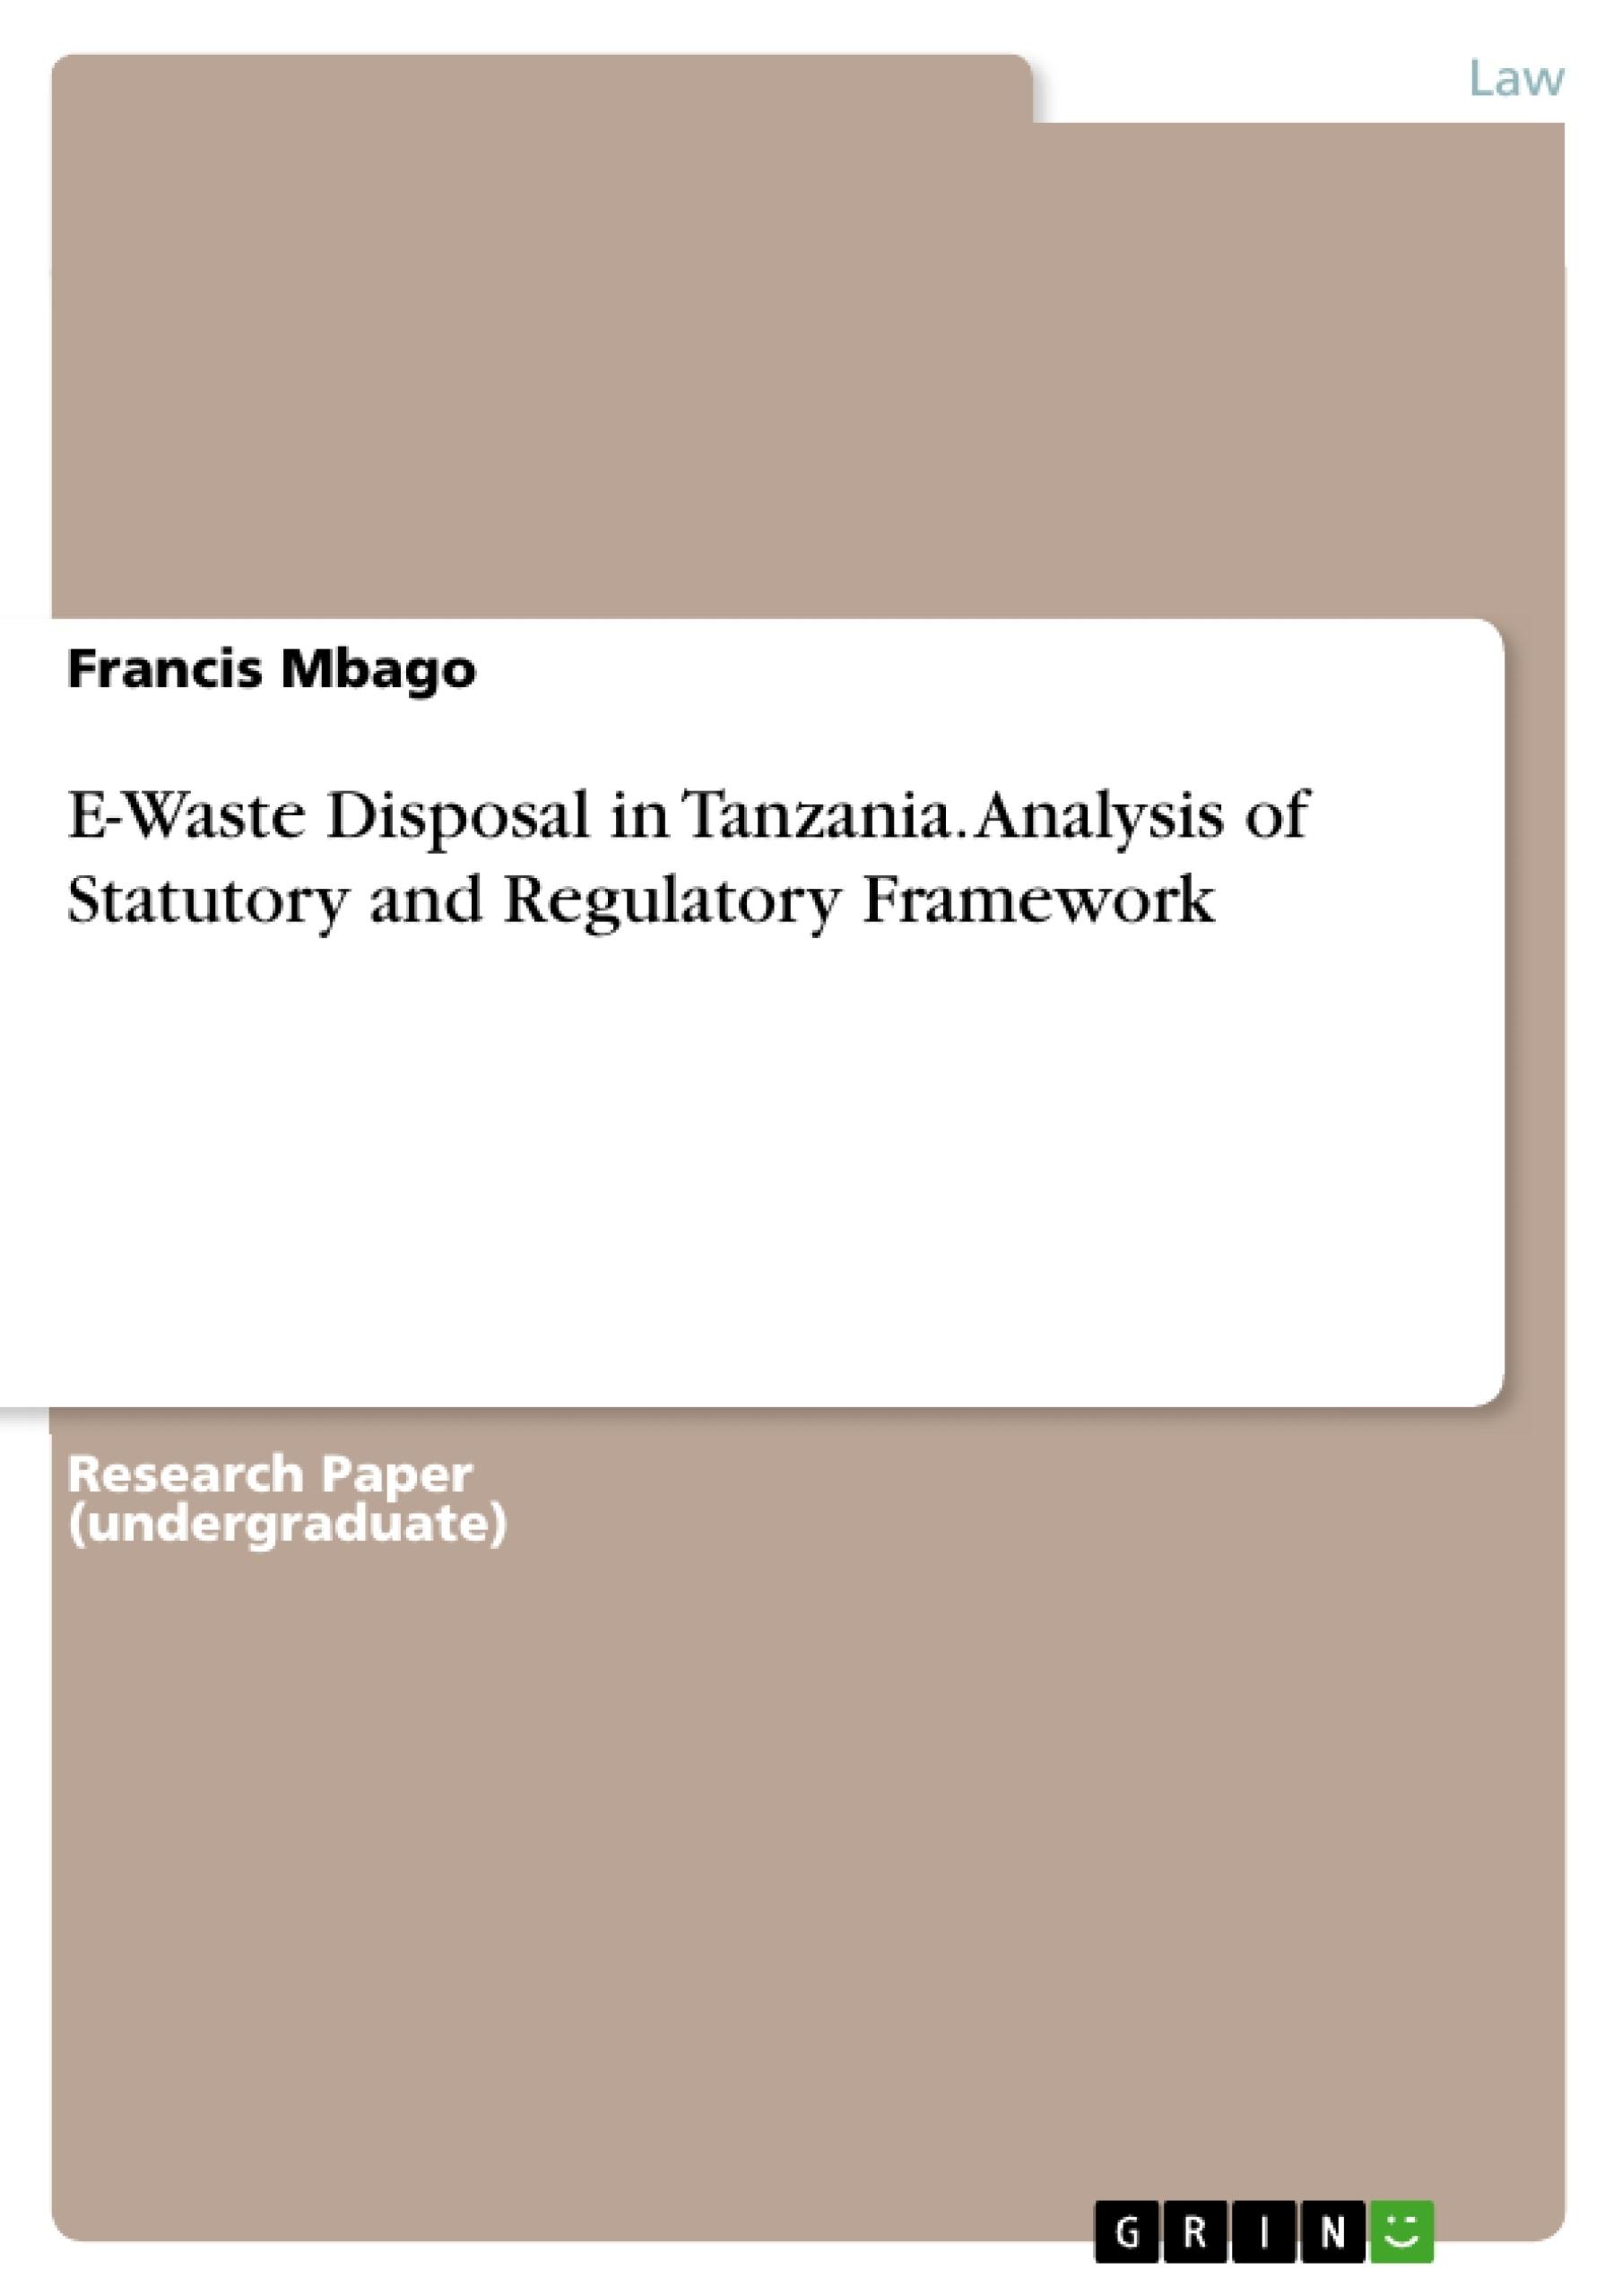 Title: E-Waste Disposal in Tanzania. Analysis of Statutory and Regulatory Framework